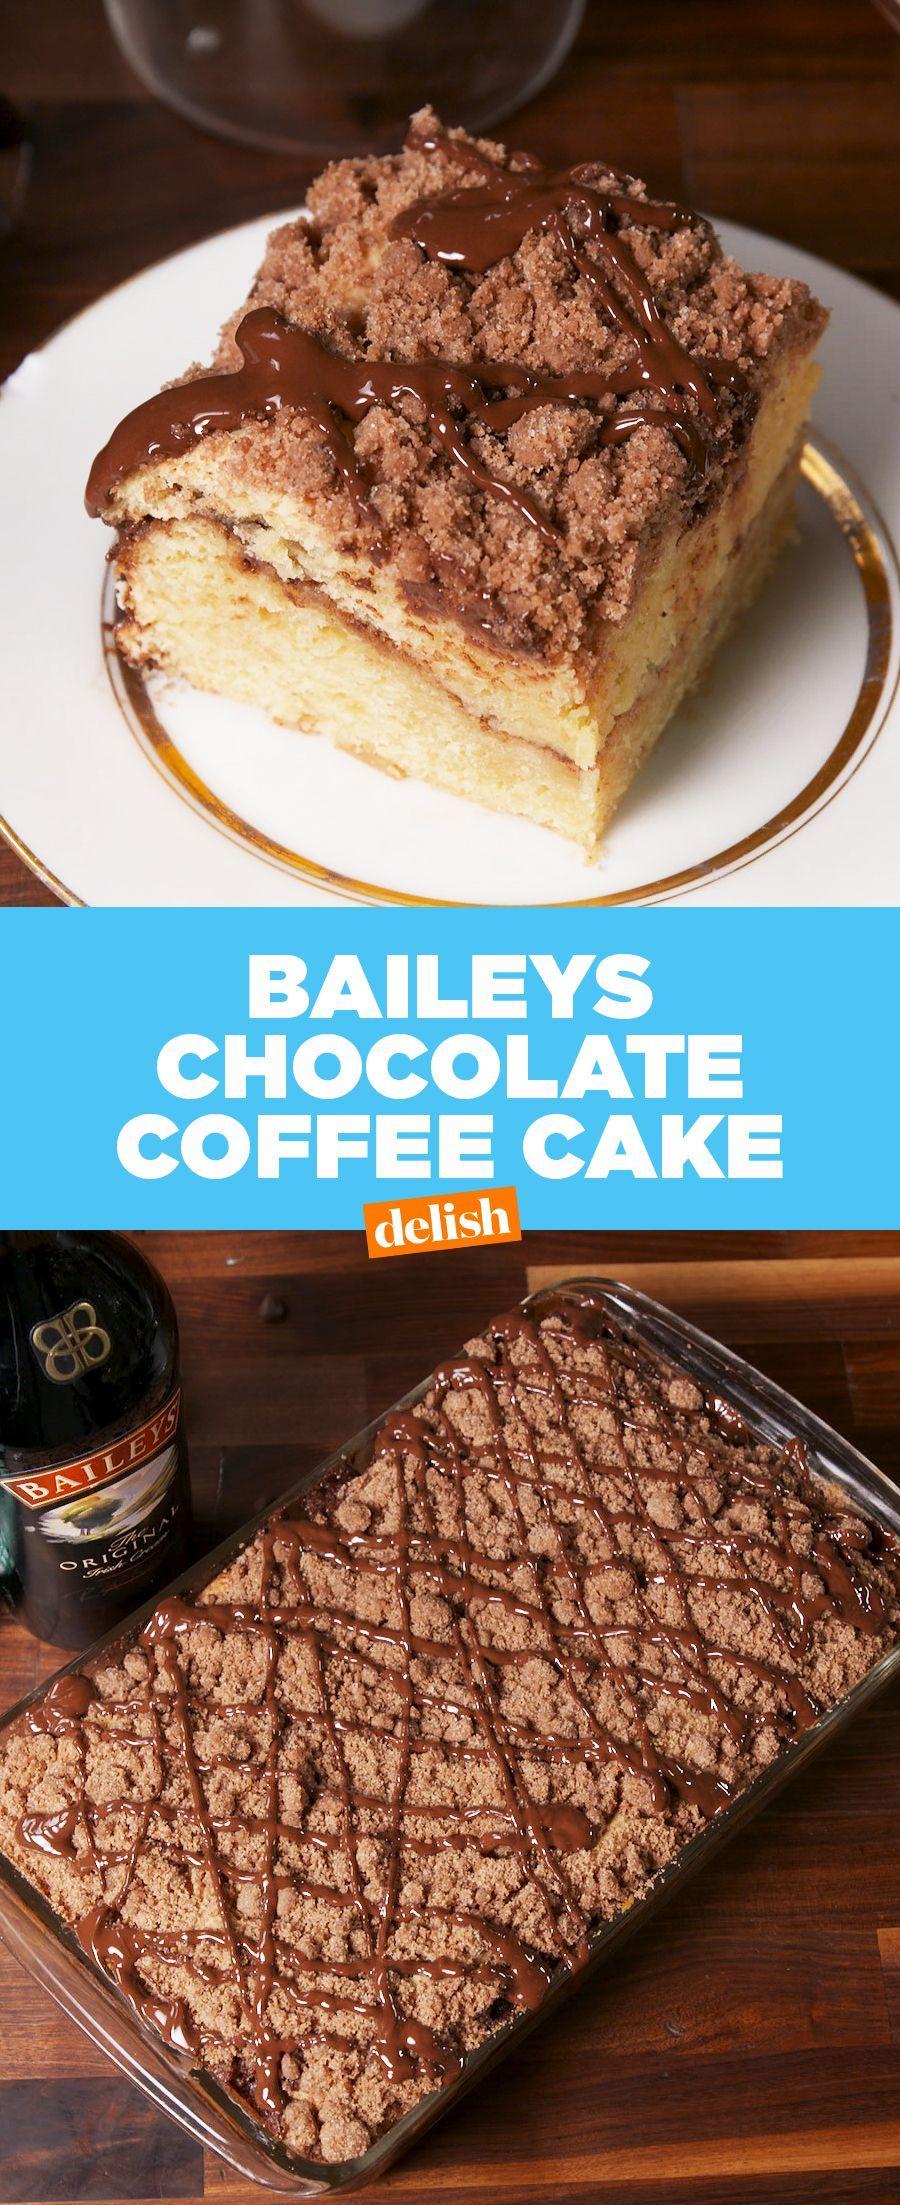 10+ 7 layer chocolate cake near me inspirations